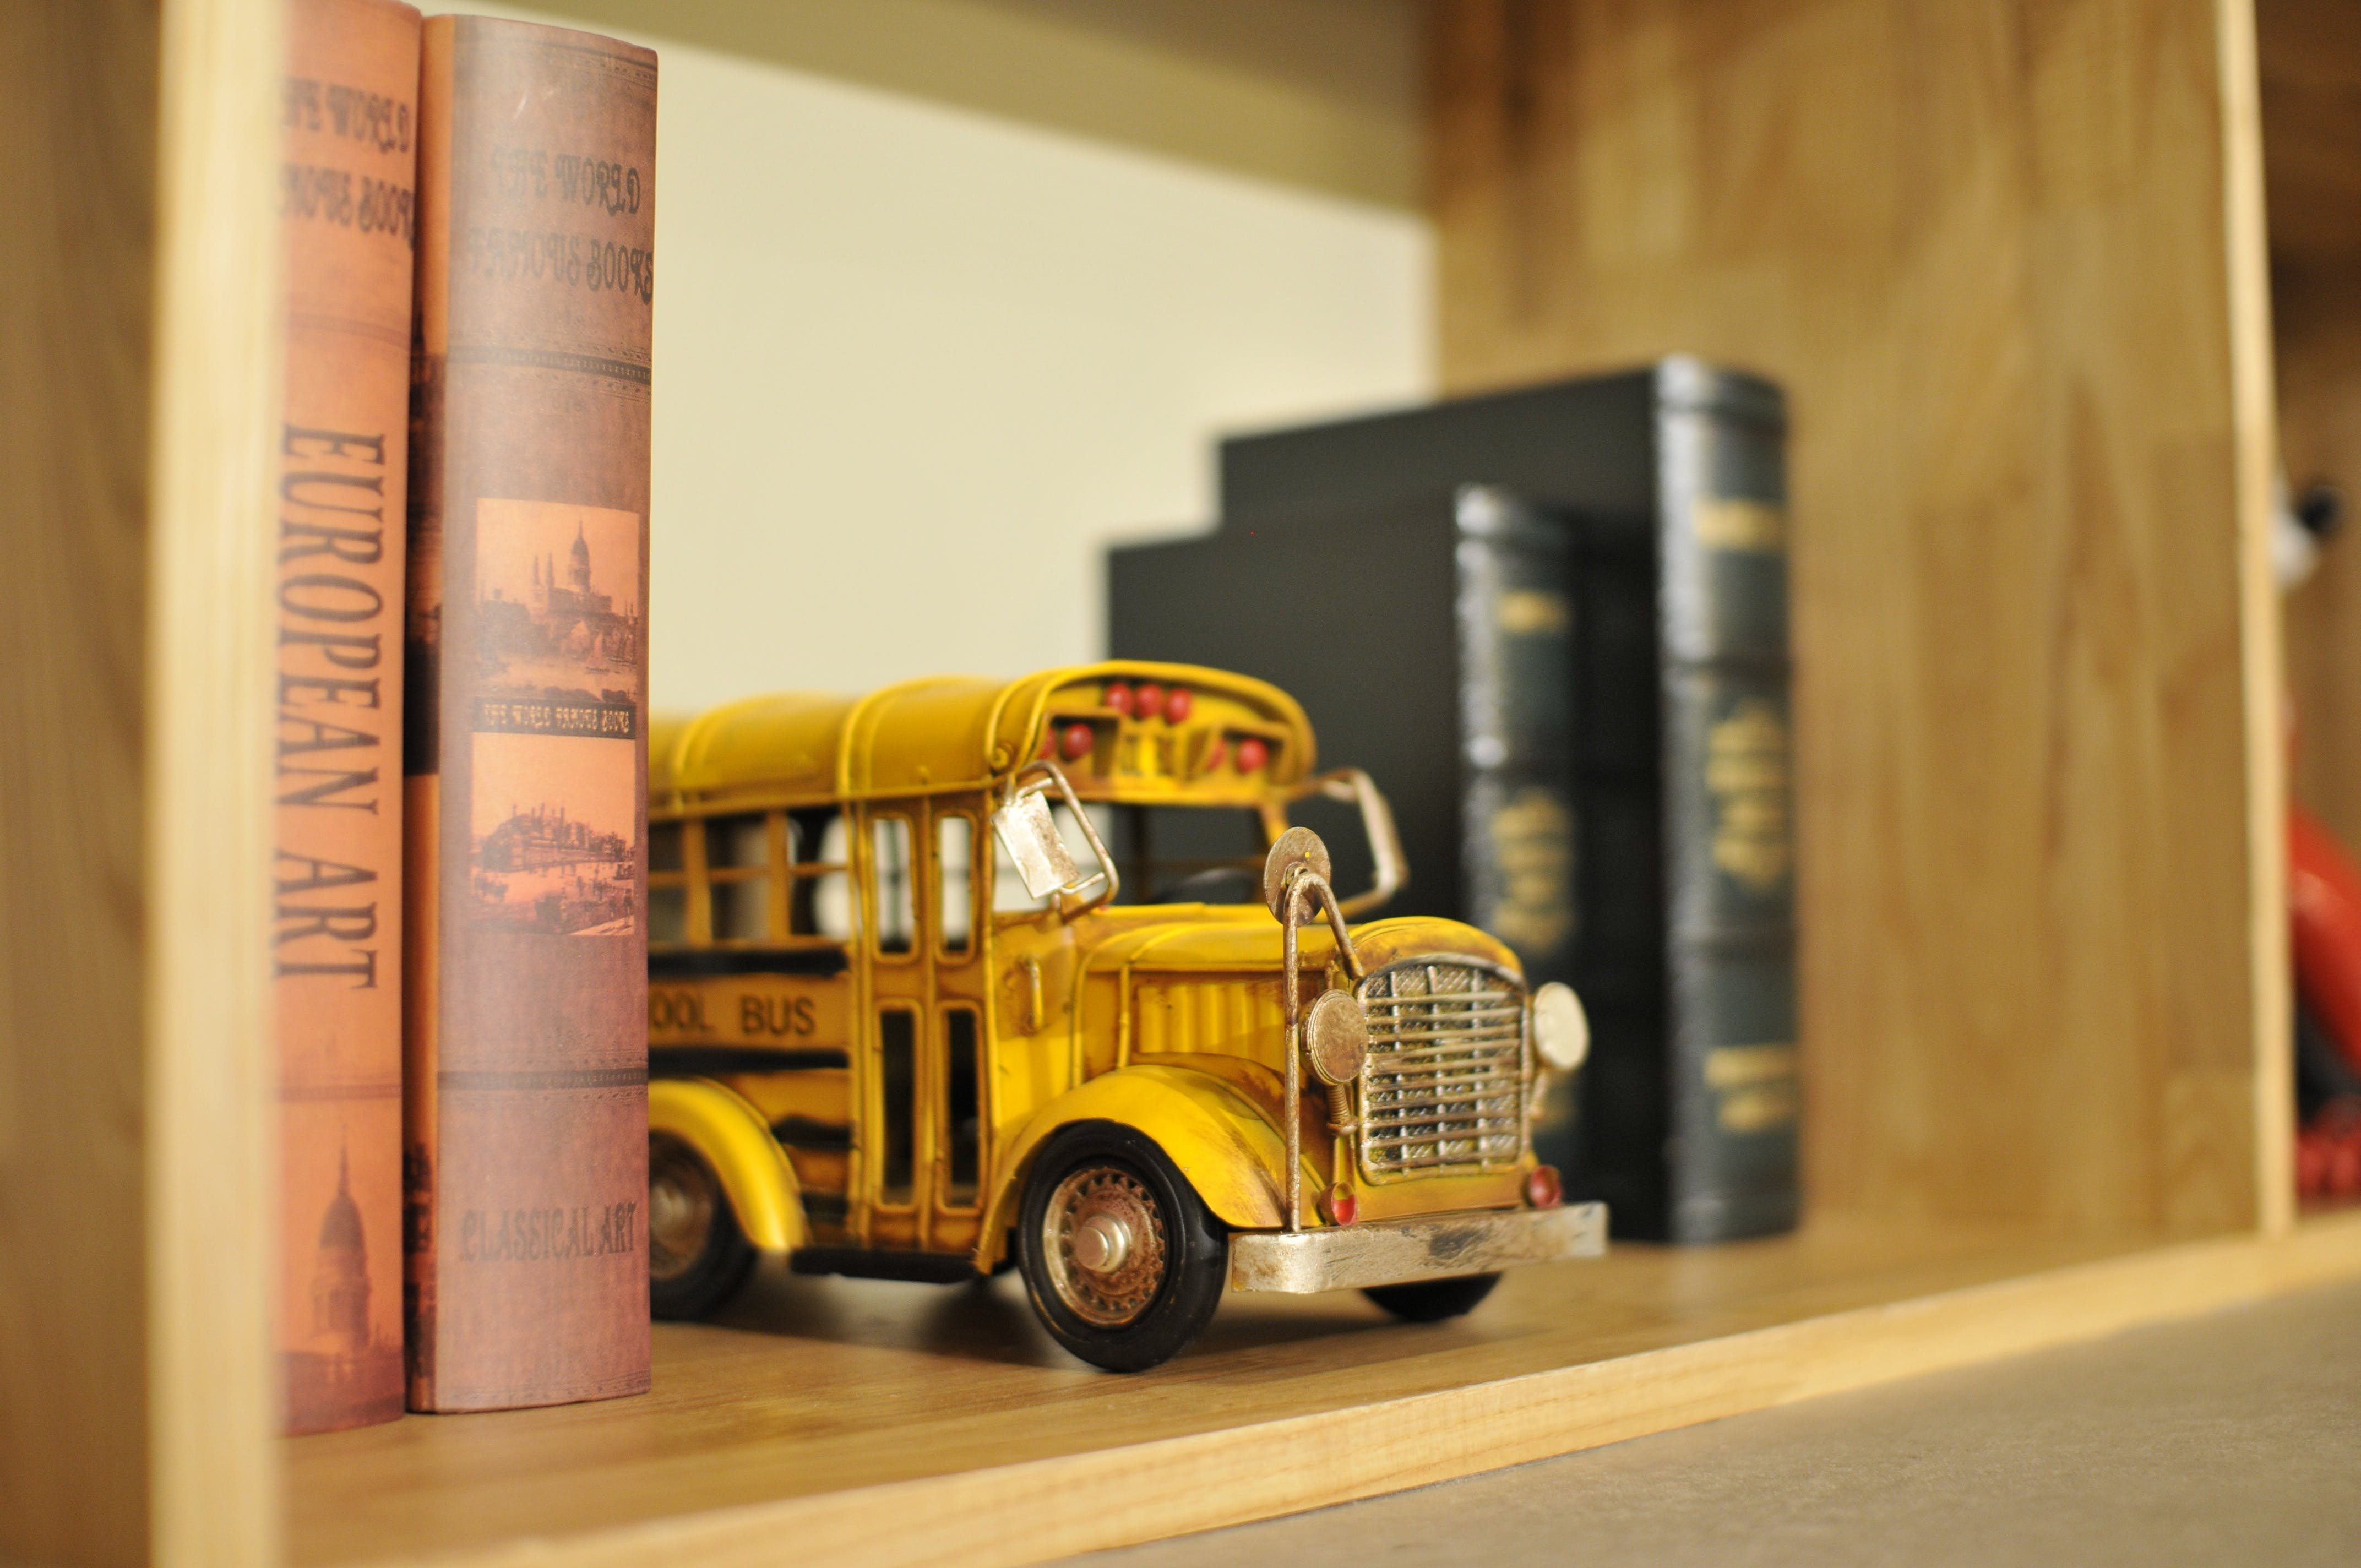 Yellow Bus Die-cast Model on Shelf Between Books